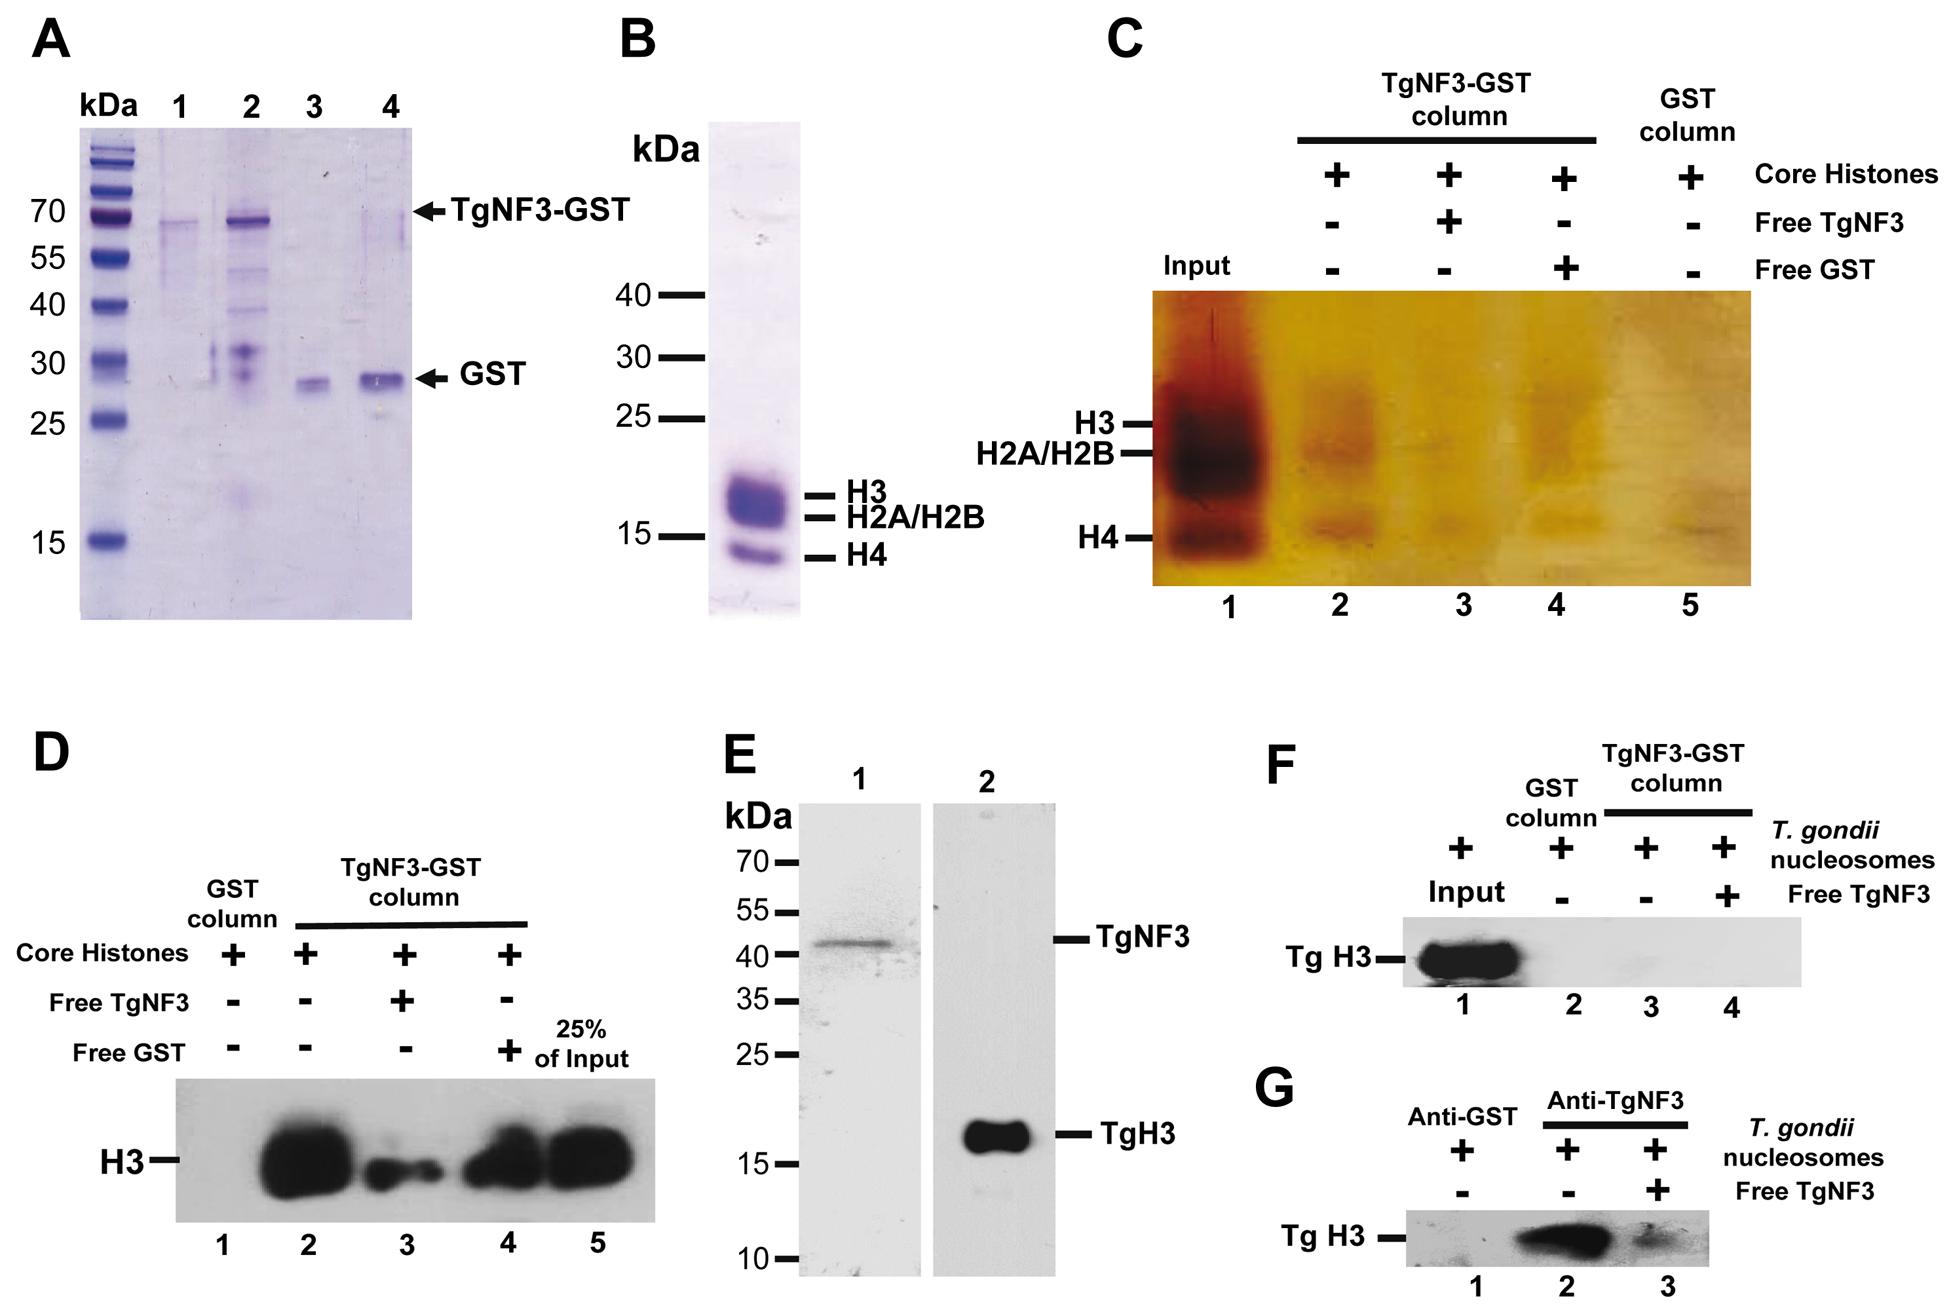 TgNF3 associates with core and nucleosome-associated histones <i>in vitro</i>.